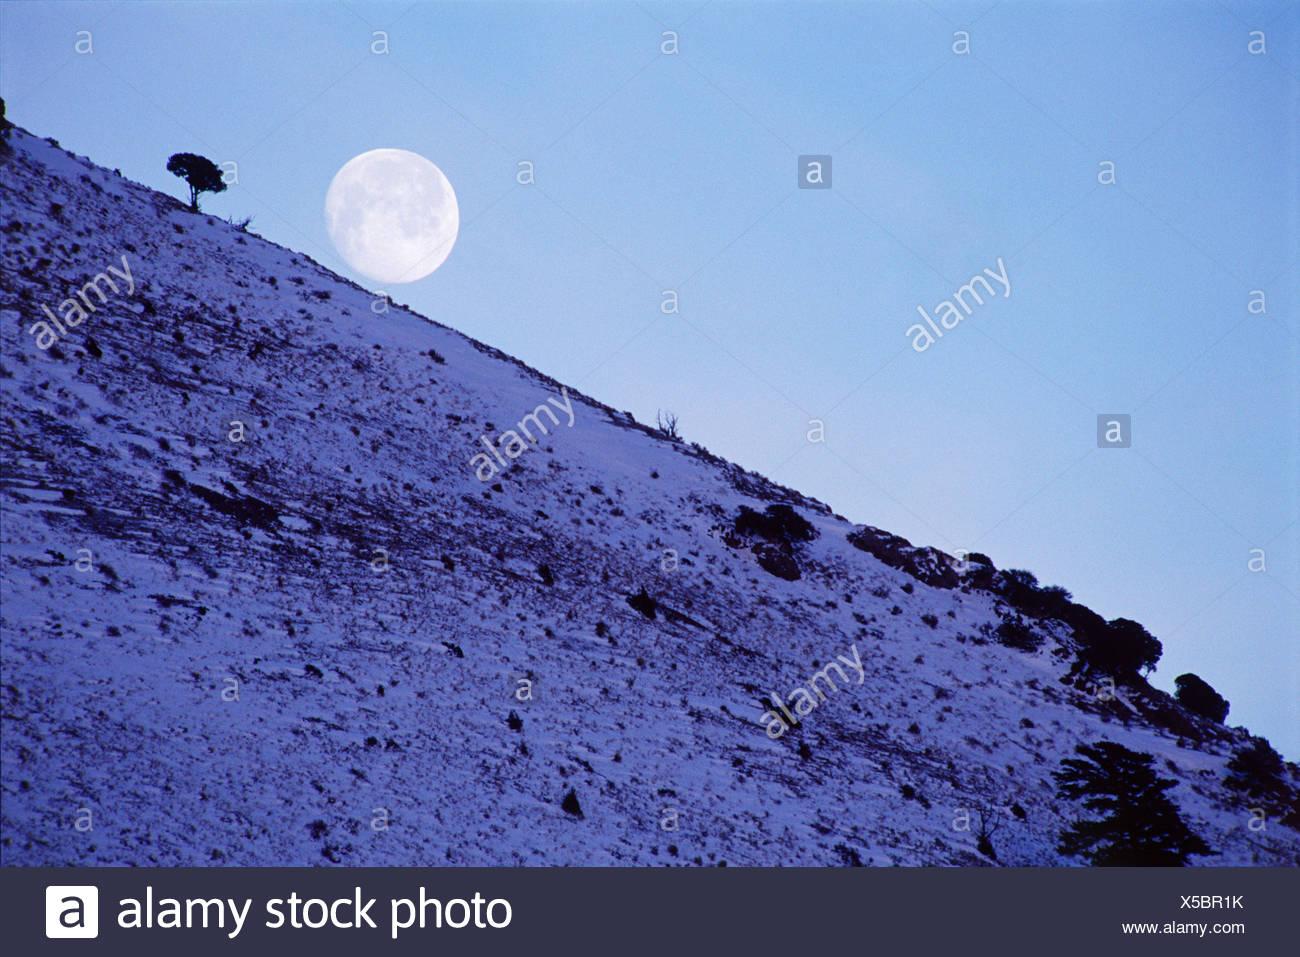 Landscape - Moon Rise - Stock Image